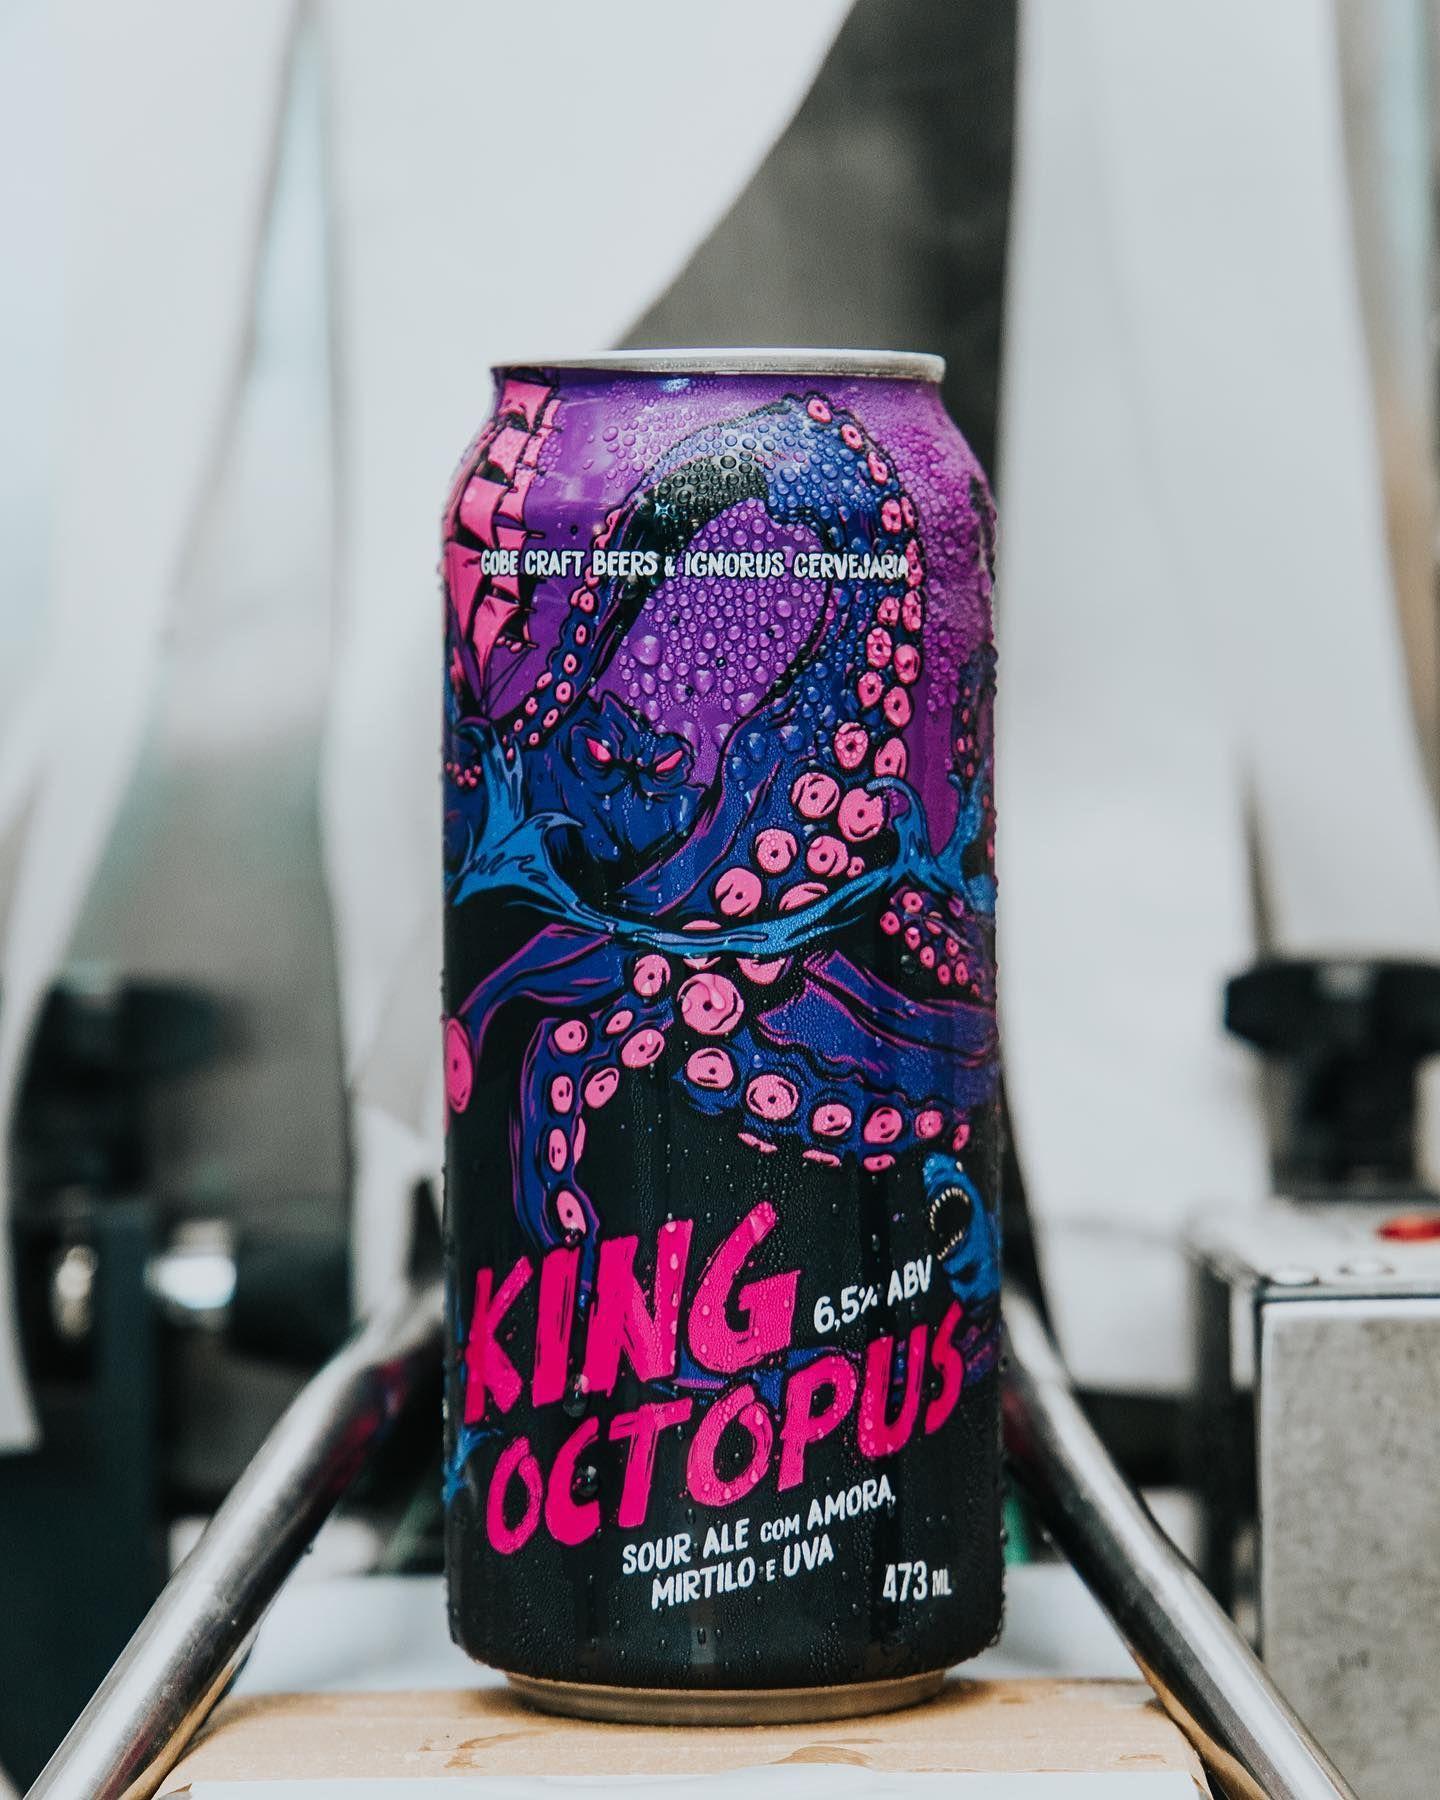 King Octopus - Sour Ale com Amora, Mirtilo e Uva - Gobe & Ignorus